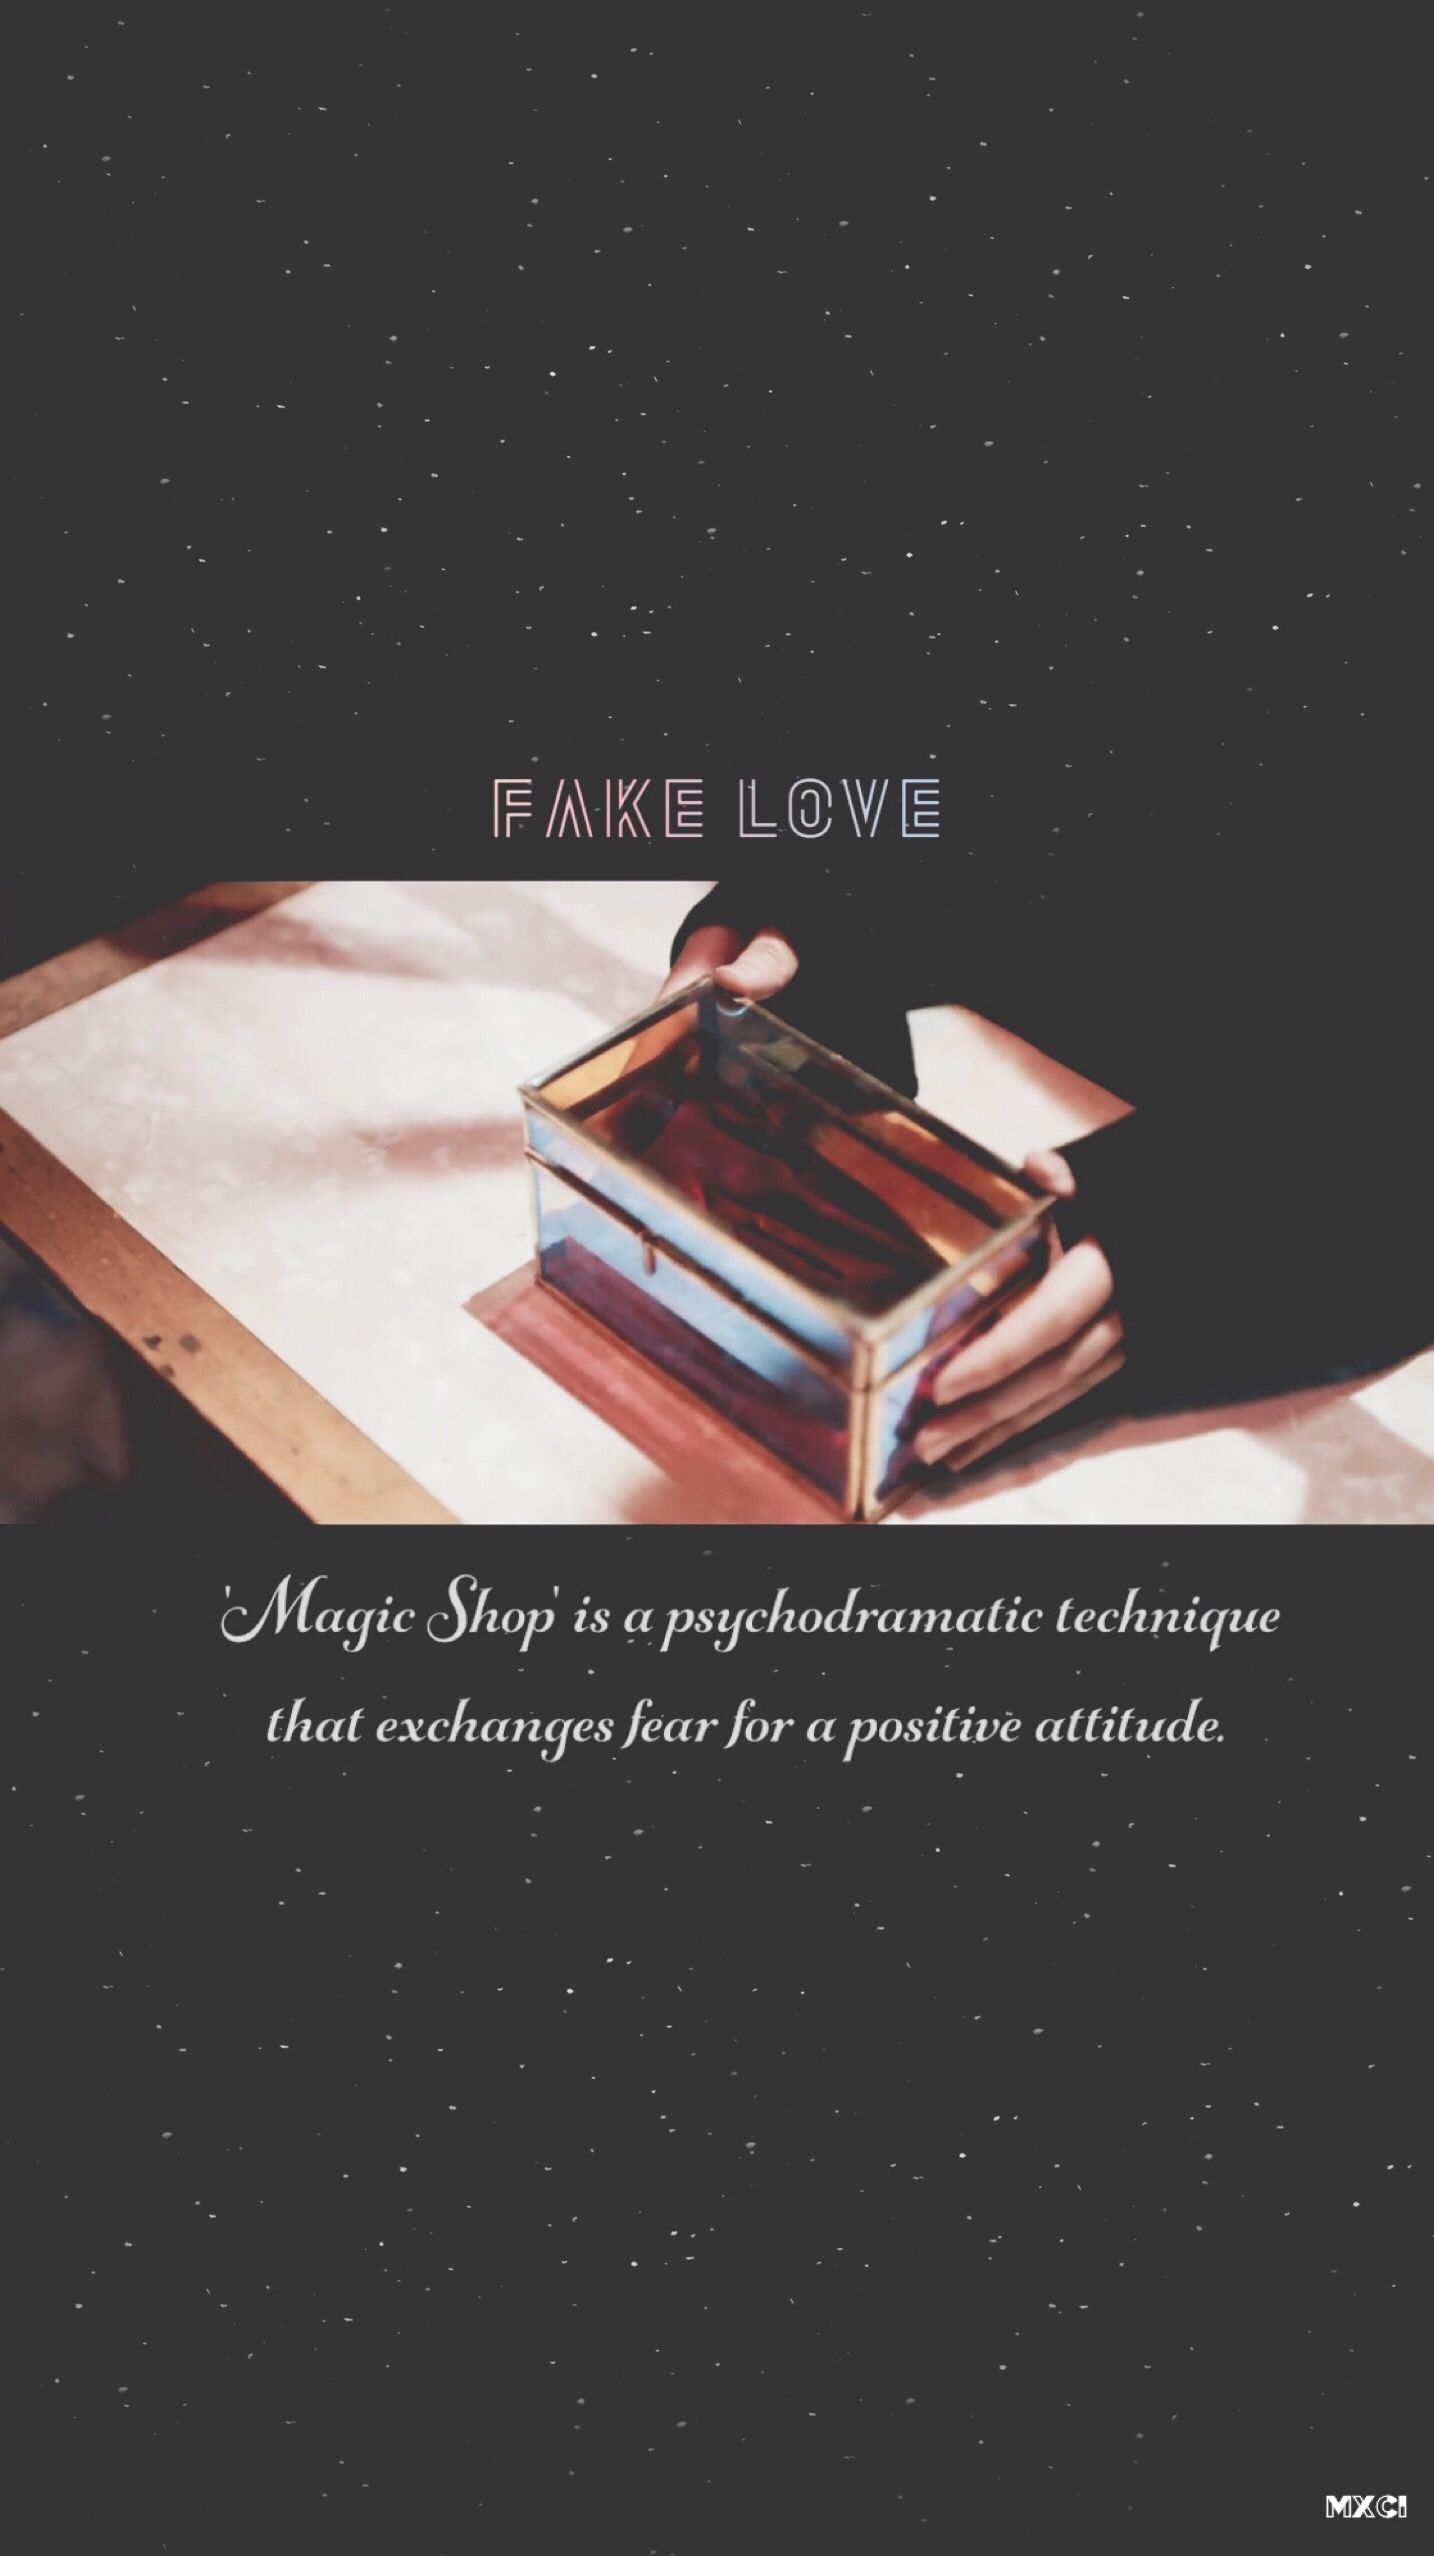 Bts Wallpaper Lytear Fake Love Teaser Just In Case